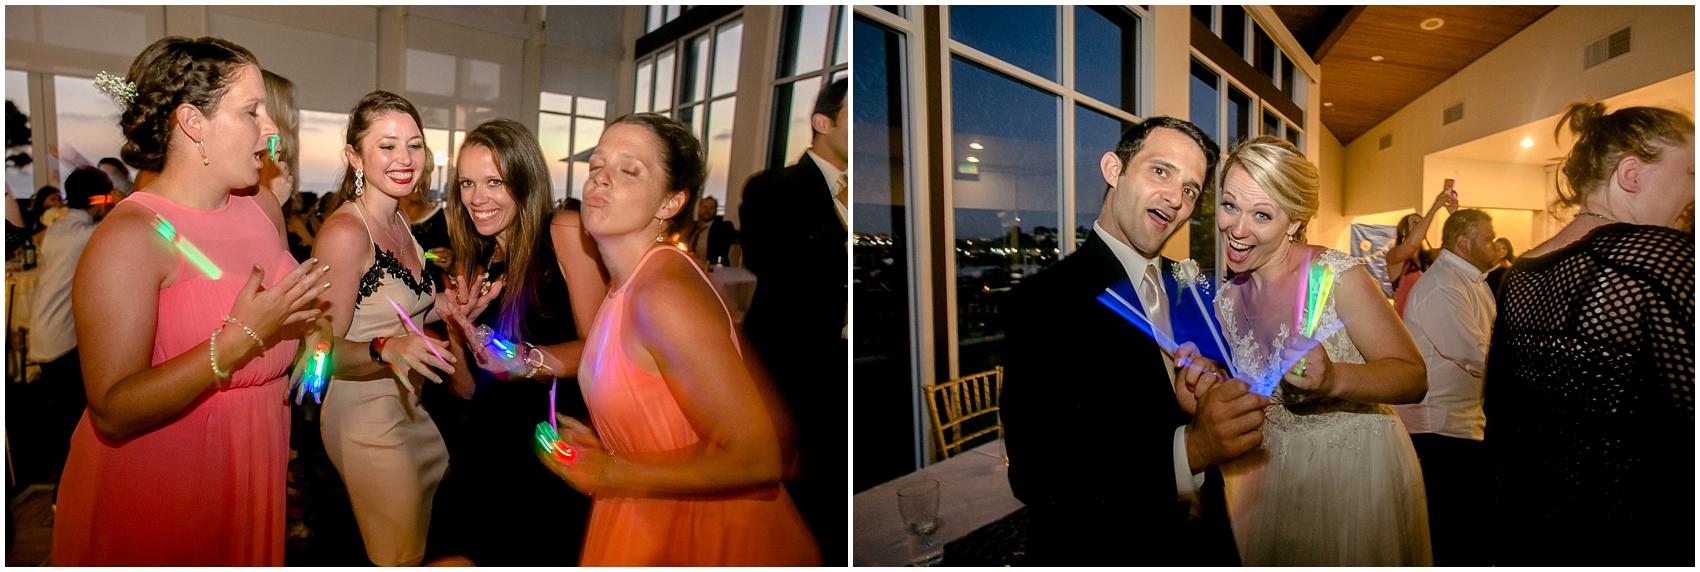 Jen and Mark's Wedding-0976.jpg